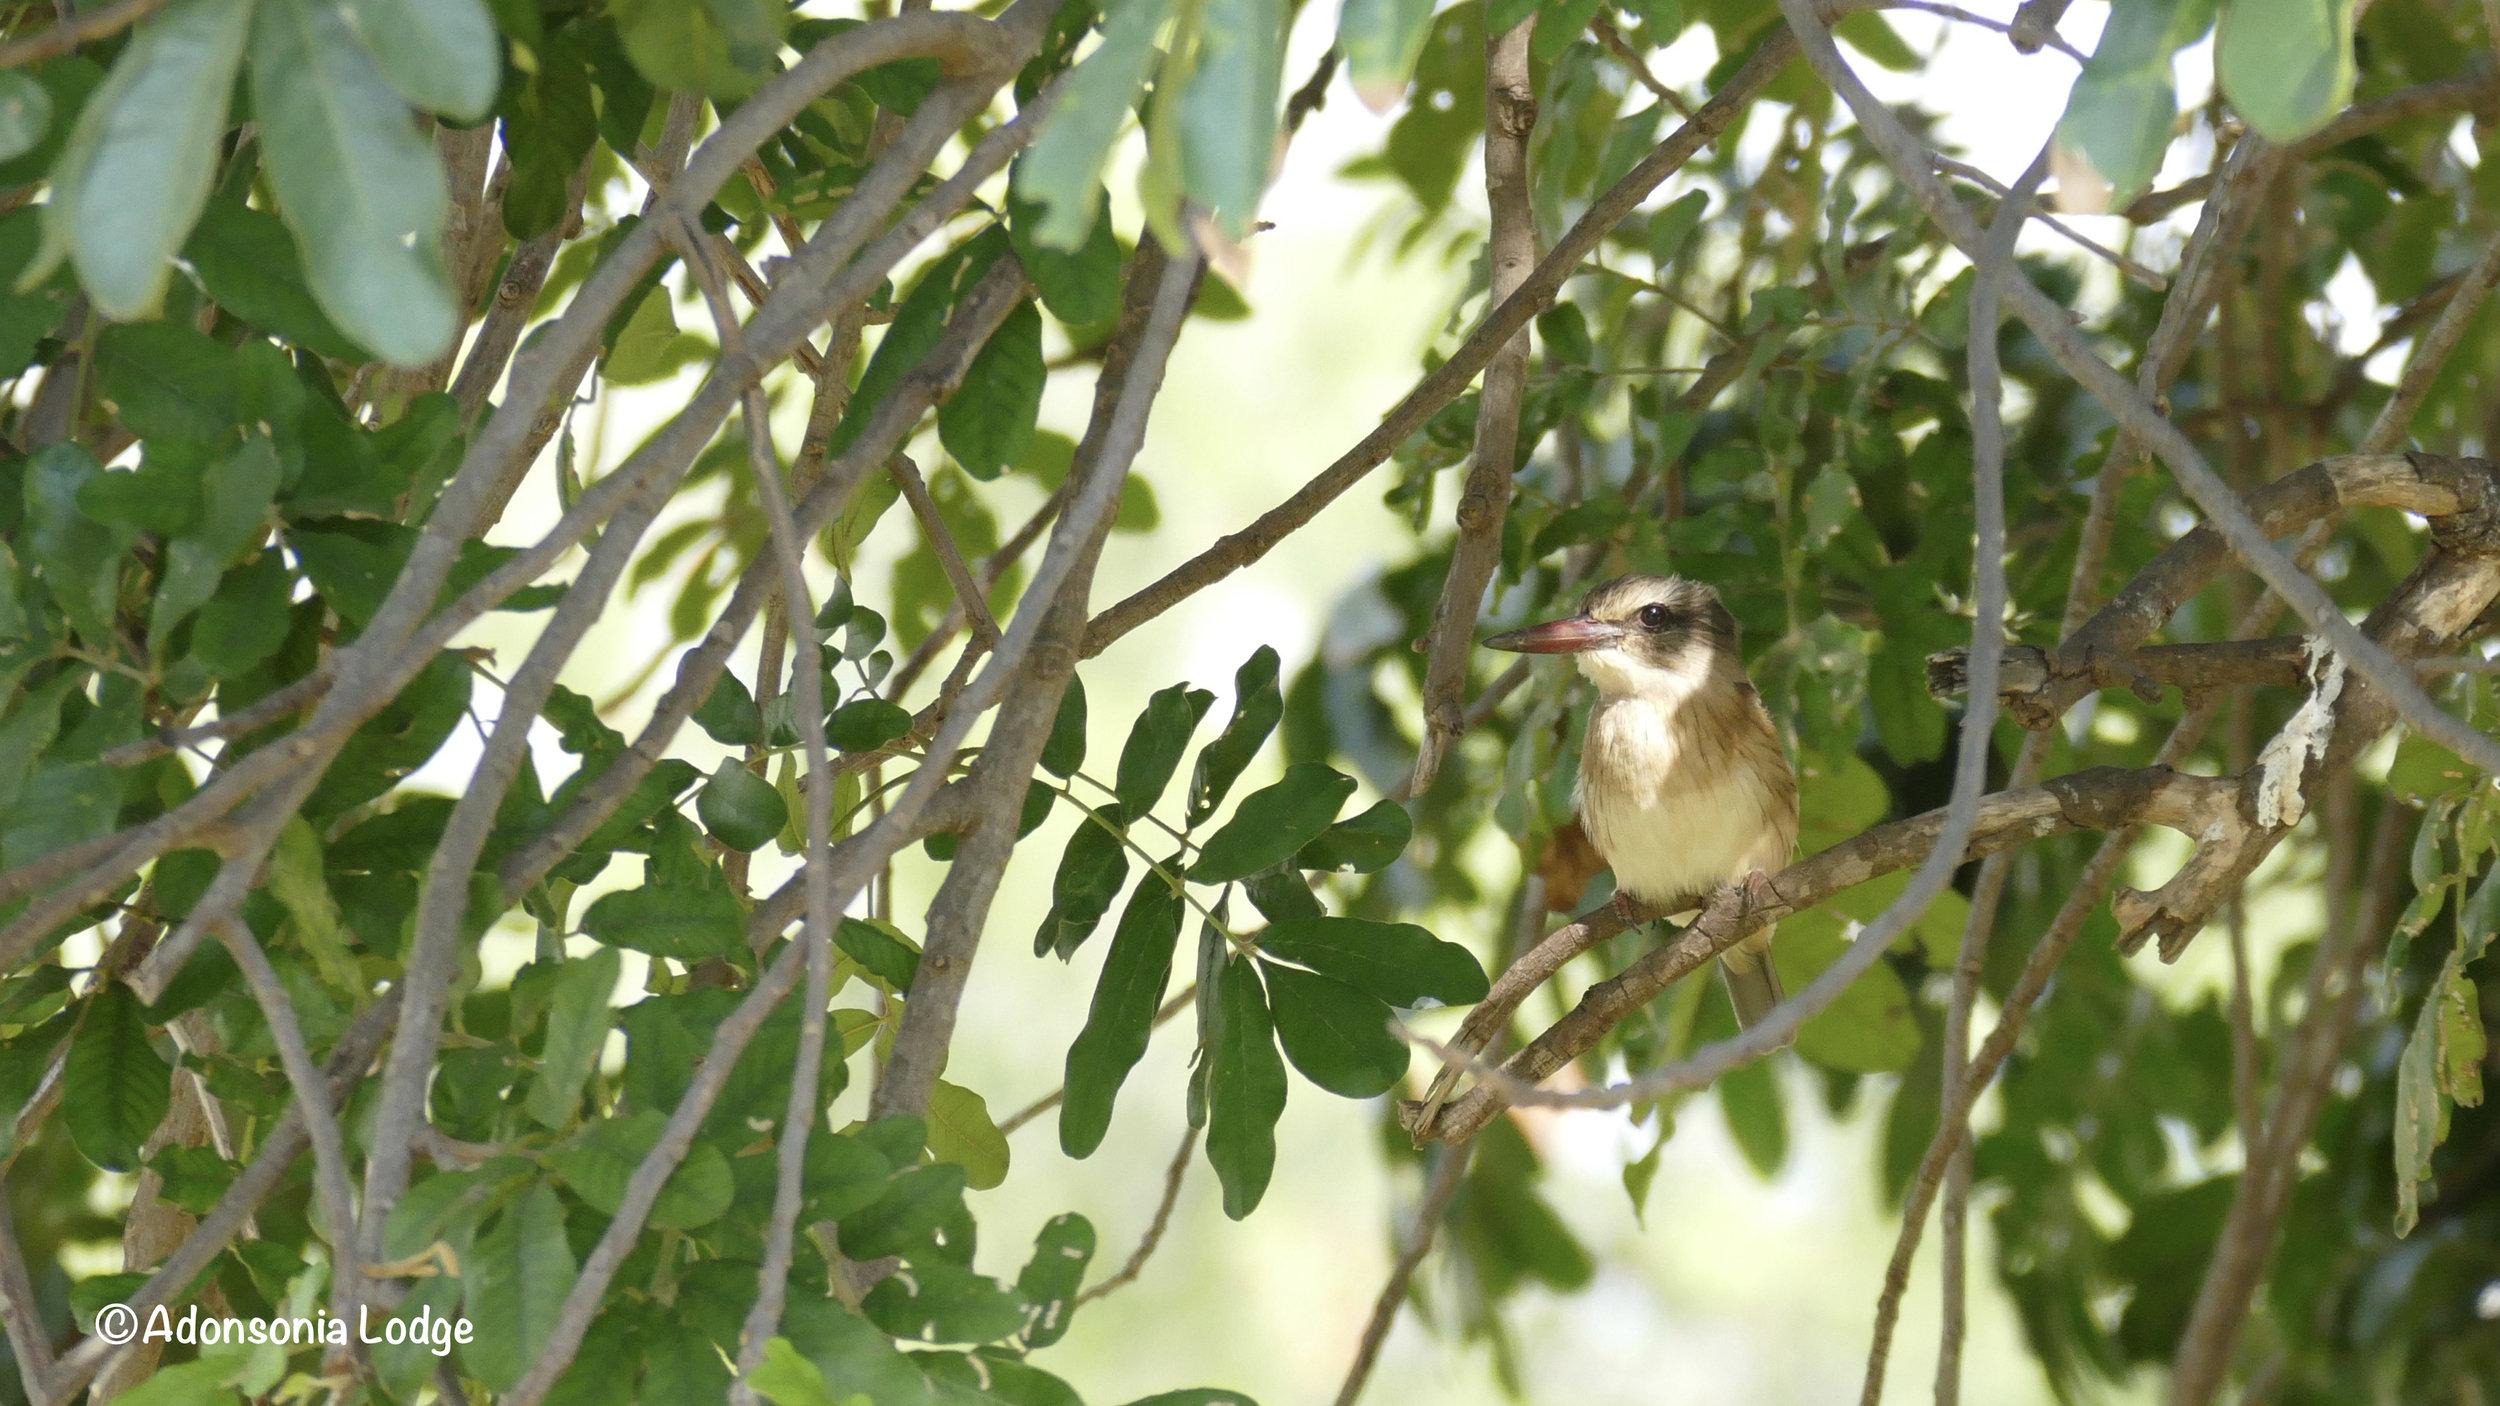 Again, hidden in the foliage….